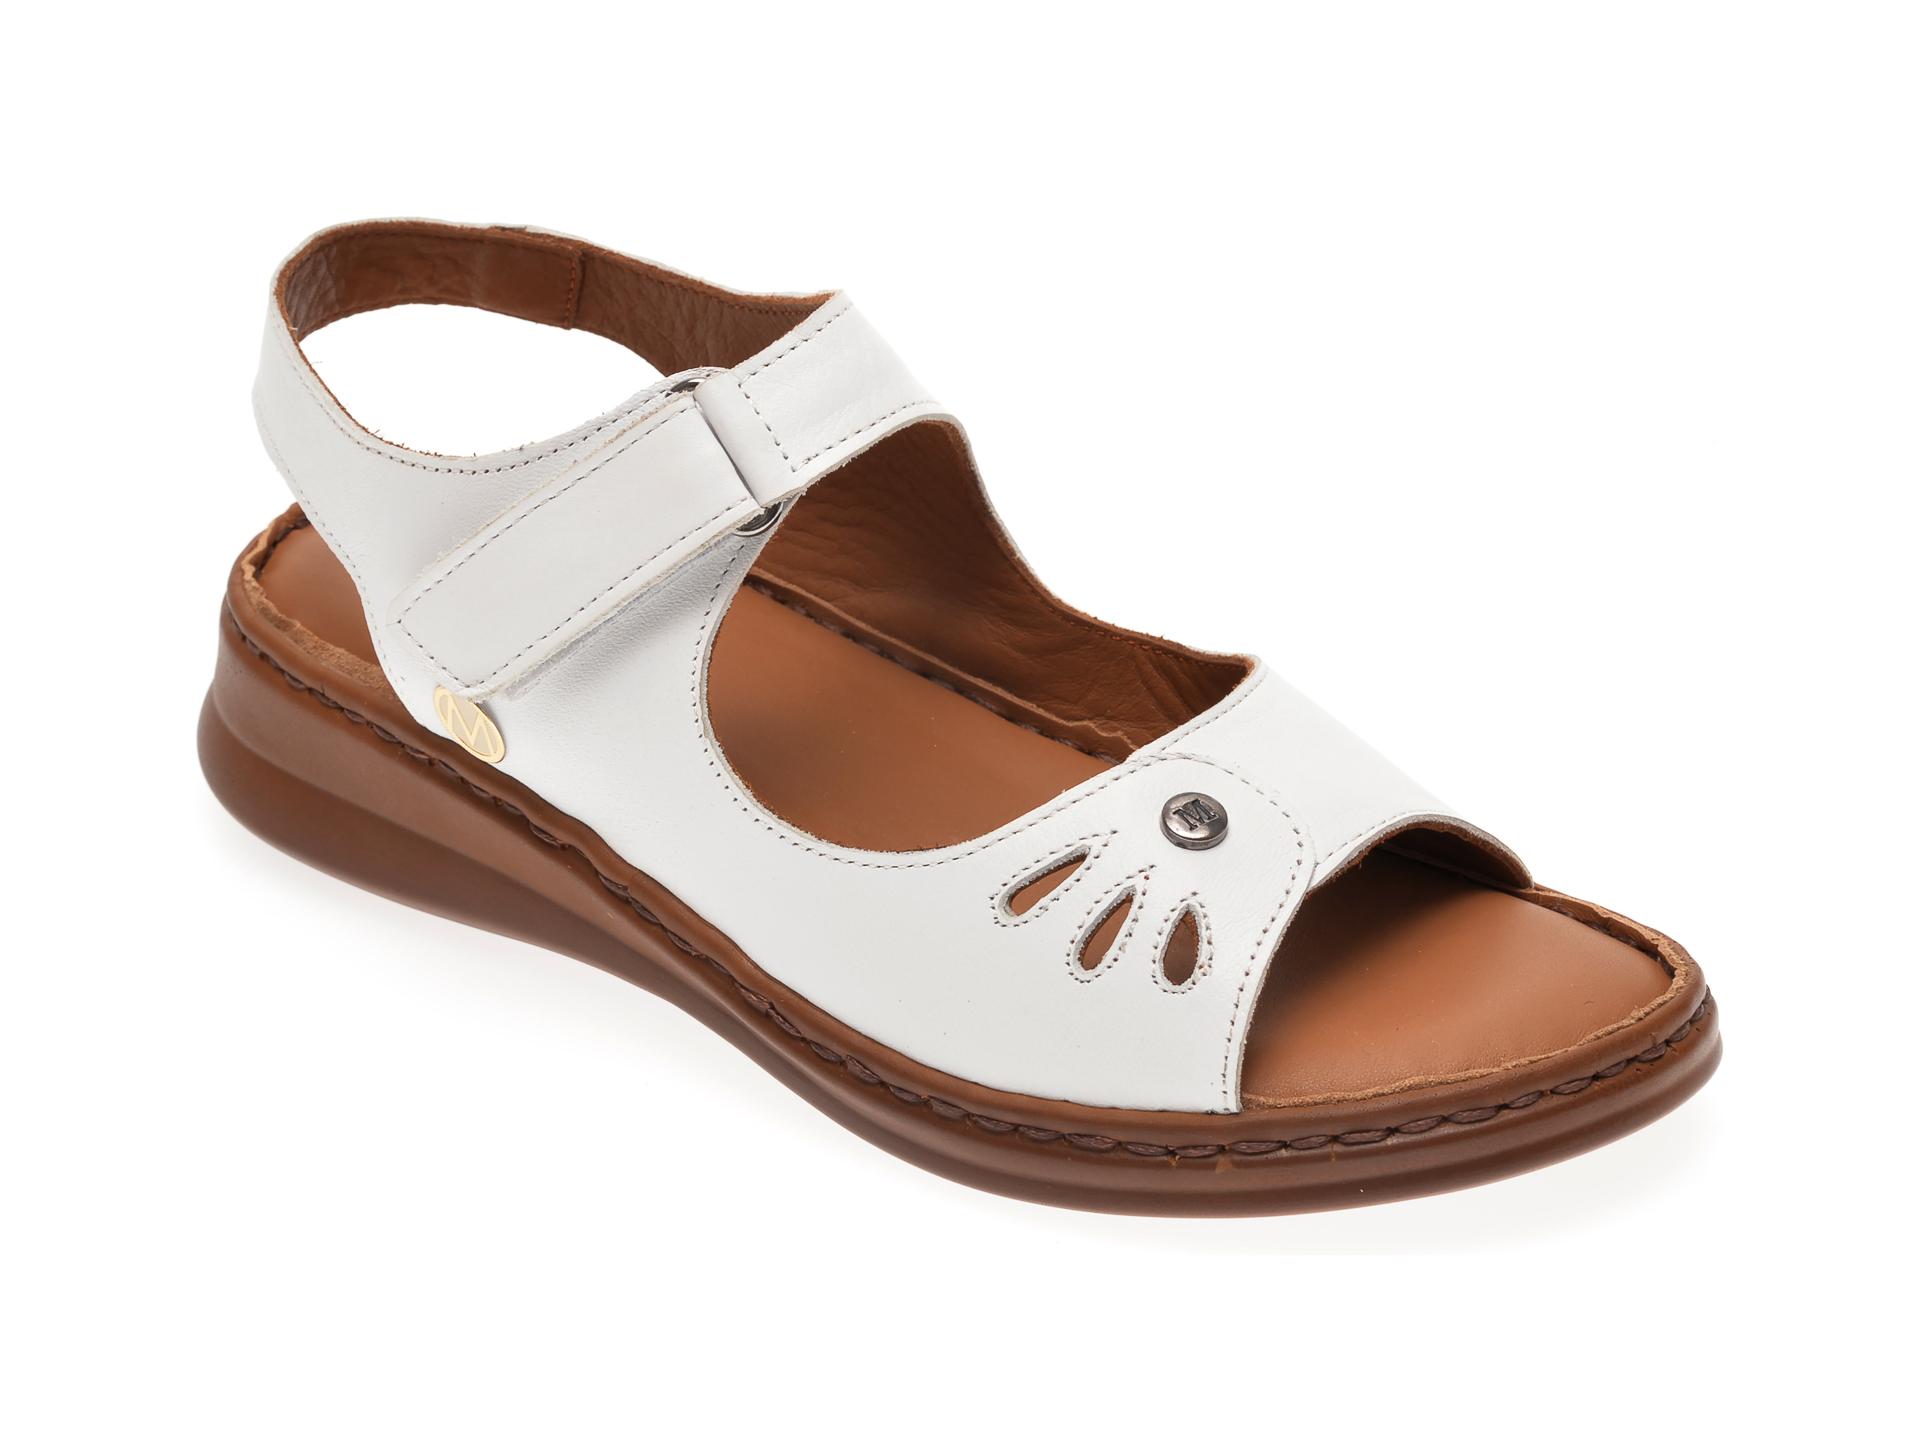 Sandale MESSIMODA albe, 20Y3564, din piele naturala